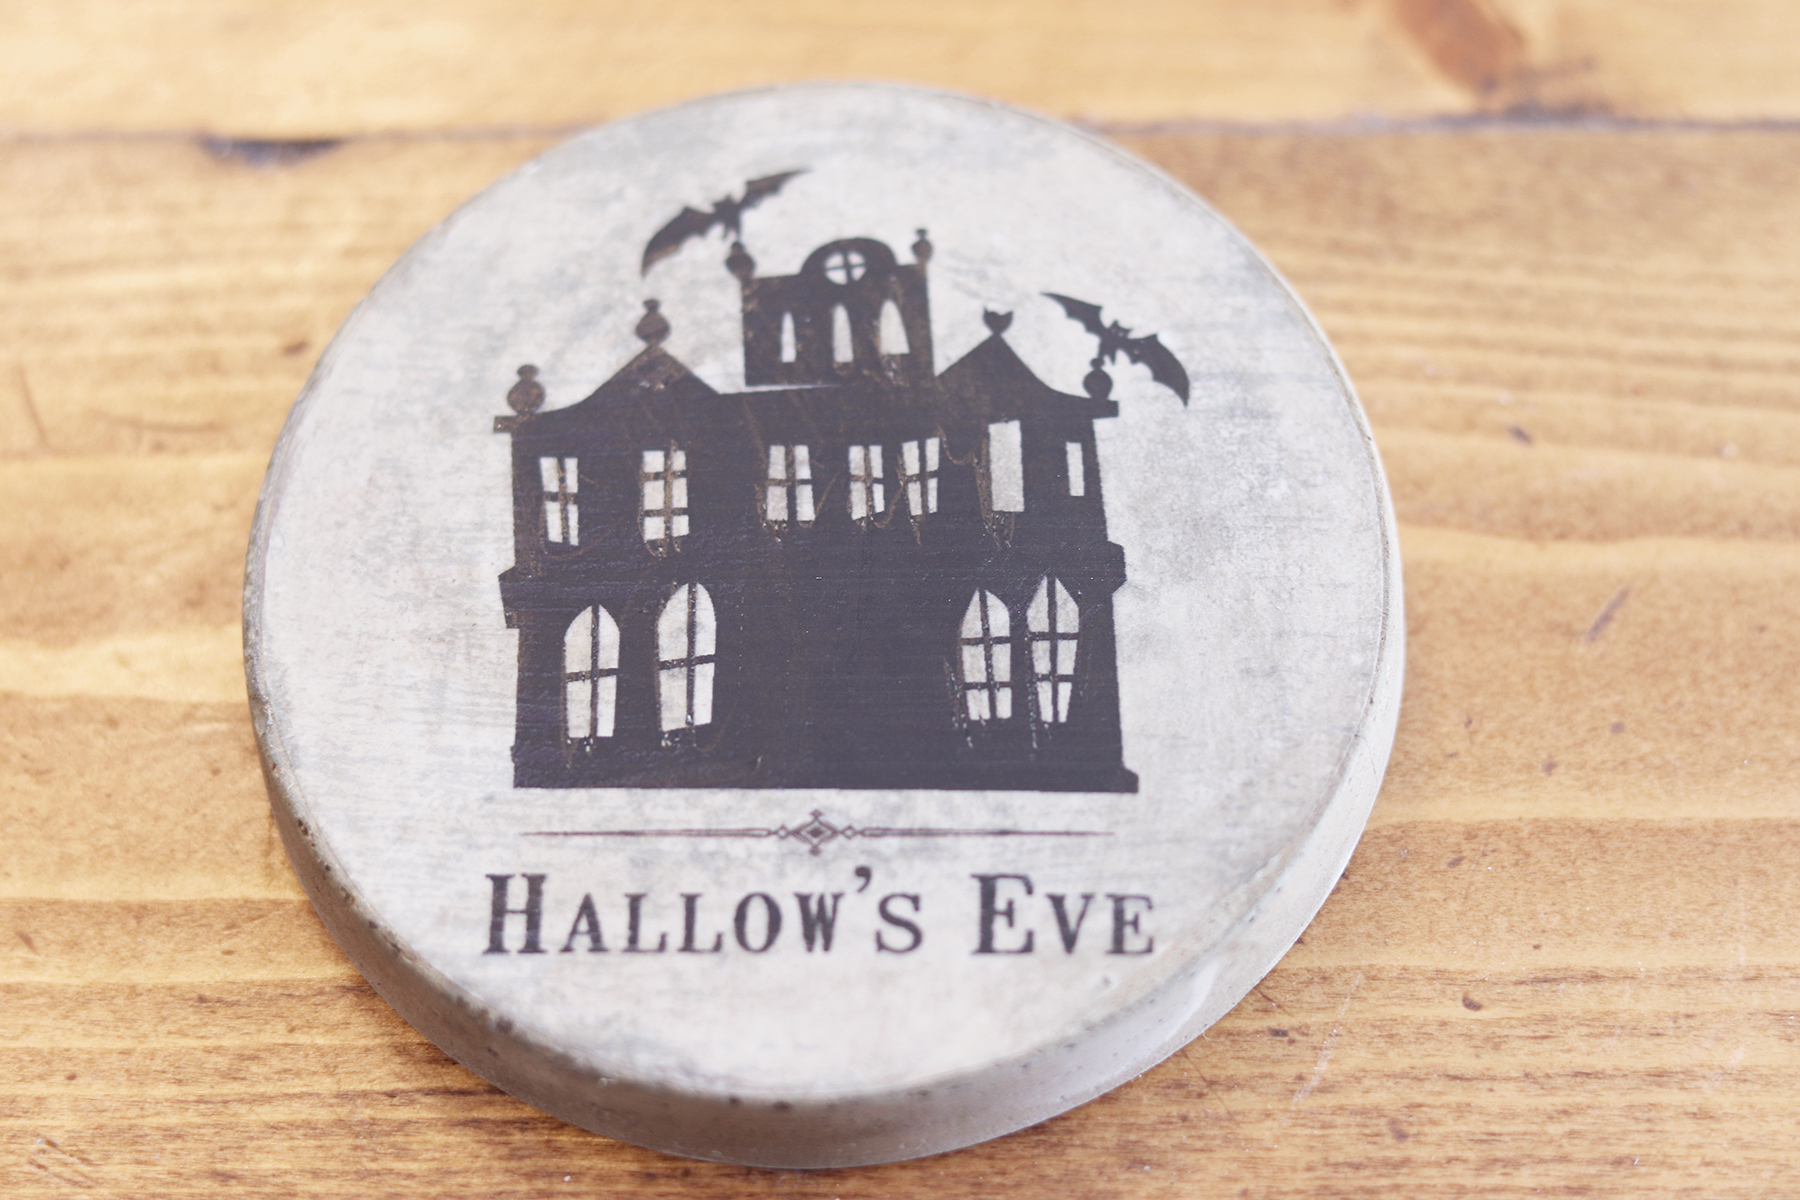 Boroughare Home Halloween Label on Coaster